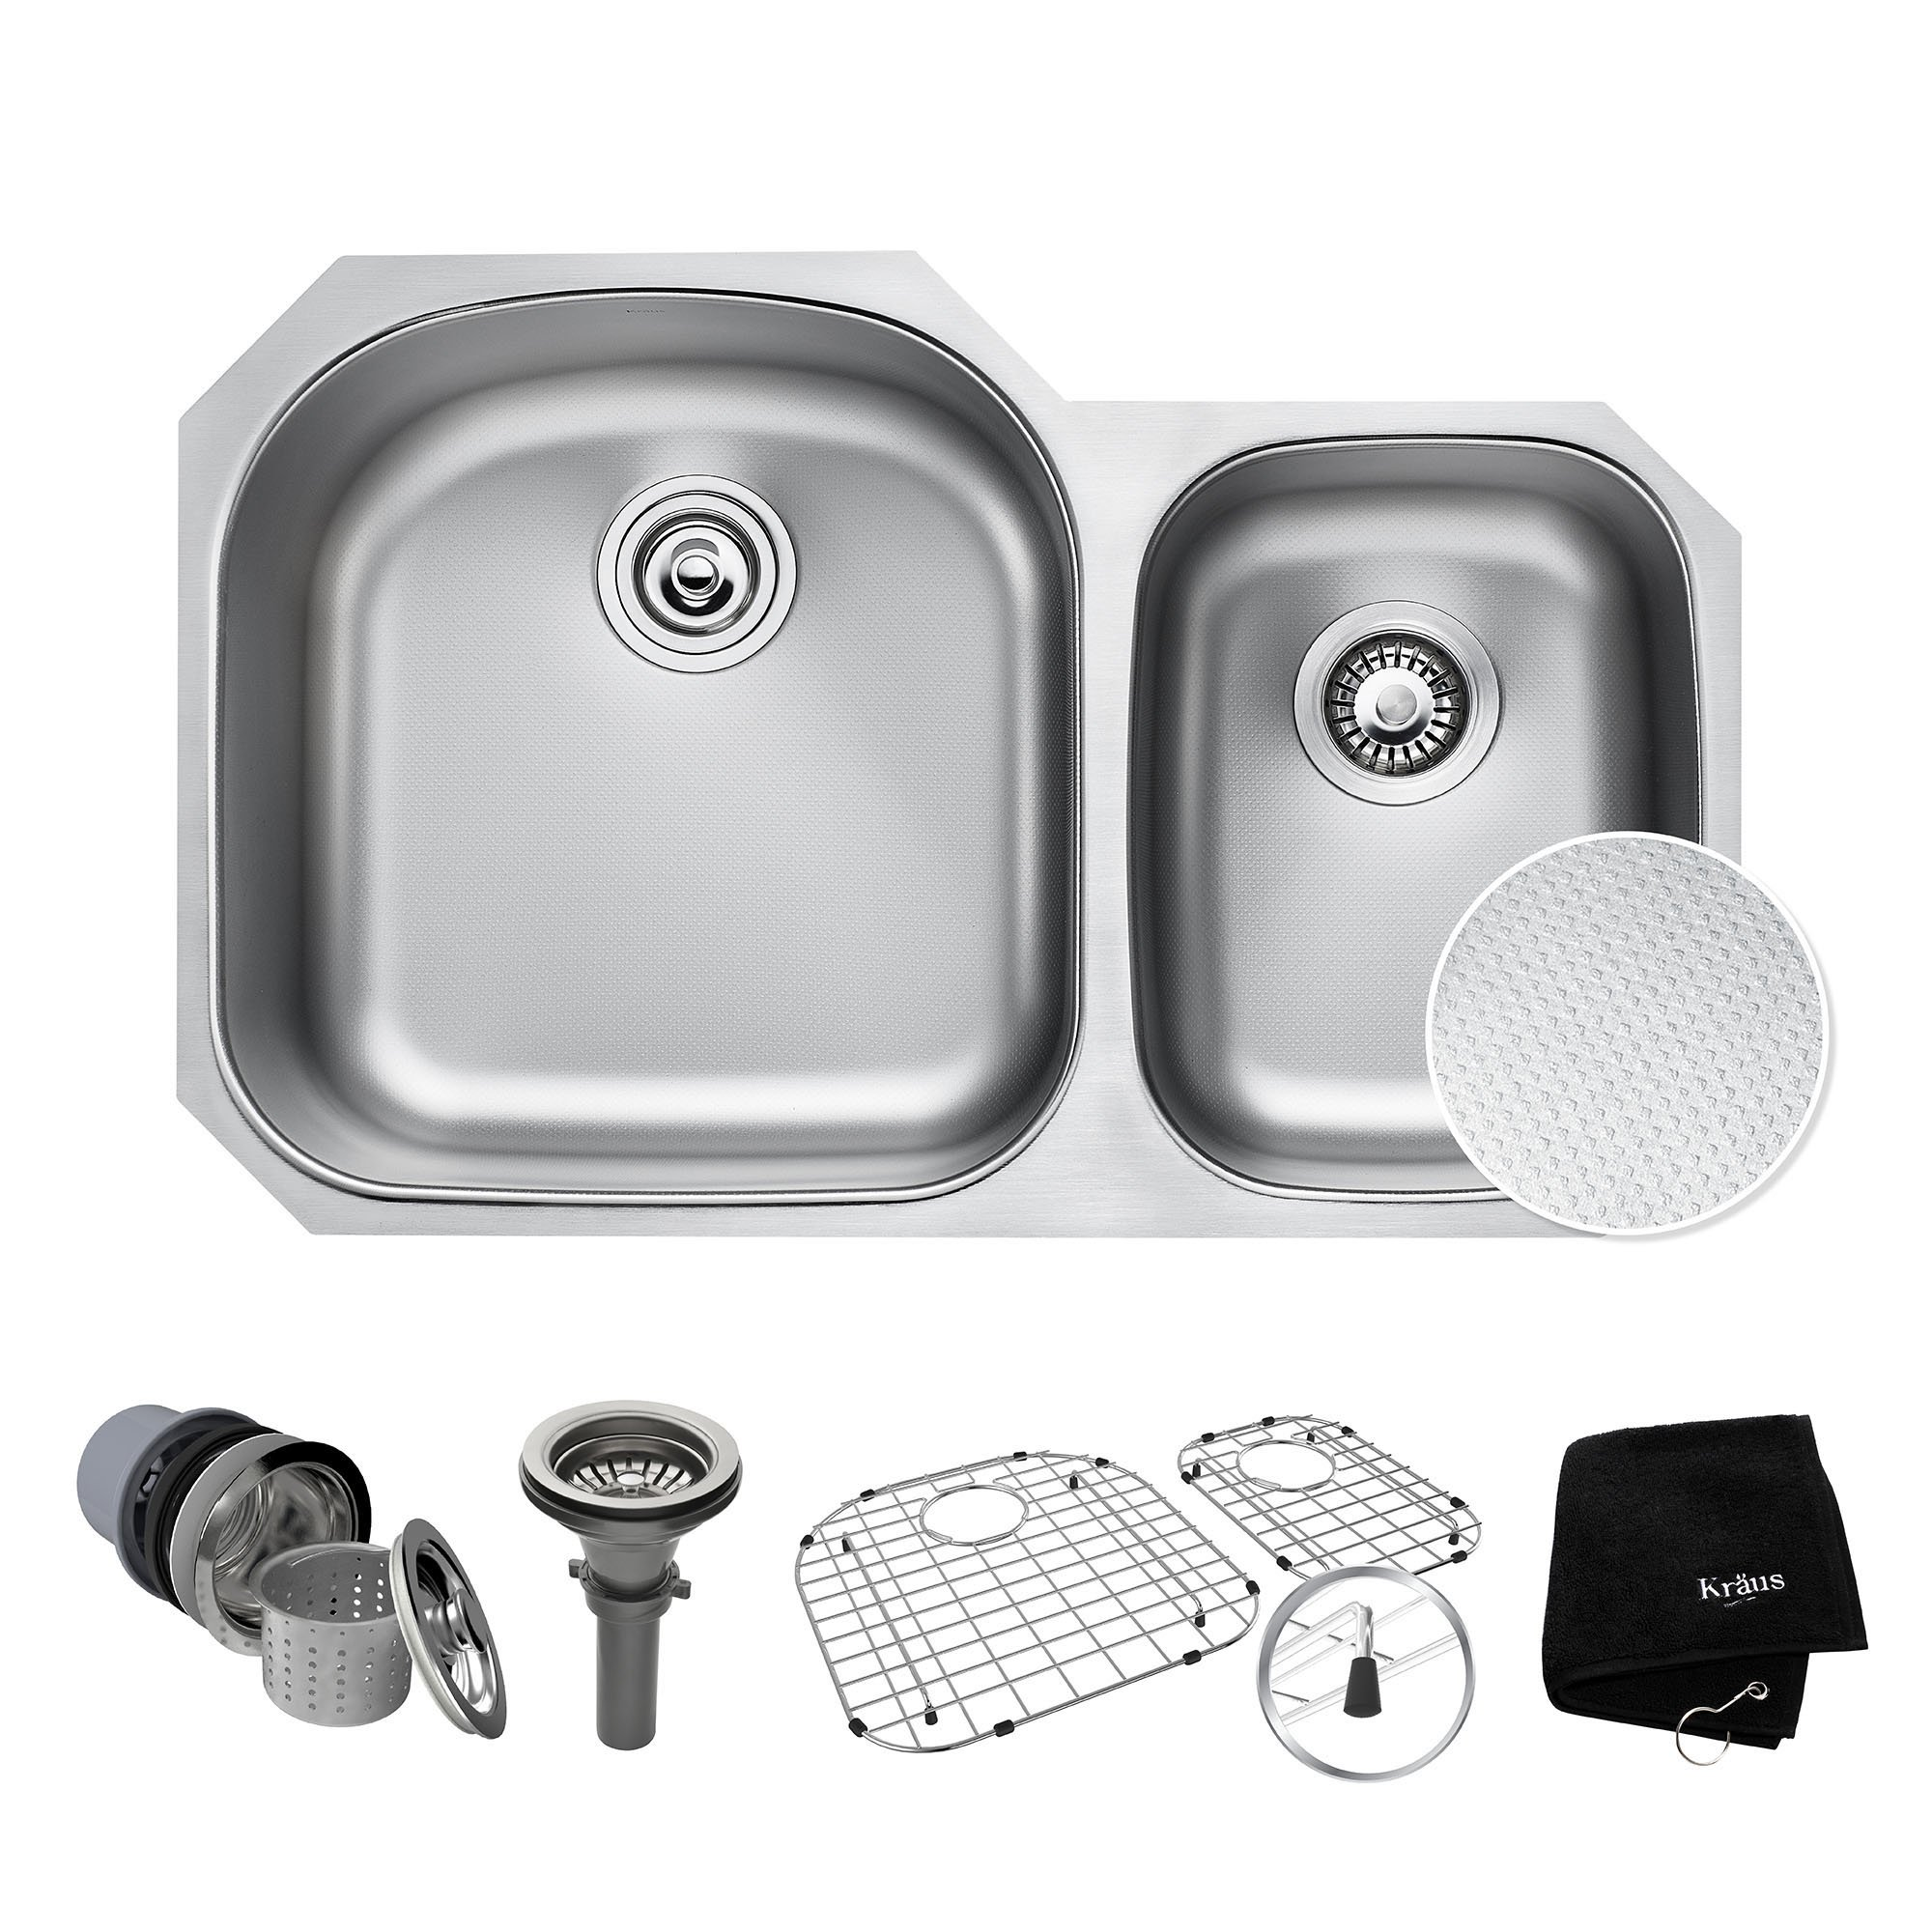 KRAUS Outlast MicroShield Scratch-Resist Stainless Steel Undermount 60/40 Double Bowl Sink, 32'' 16 Gauge, Premier Series KBU23E